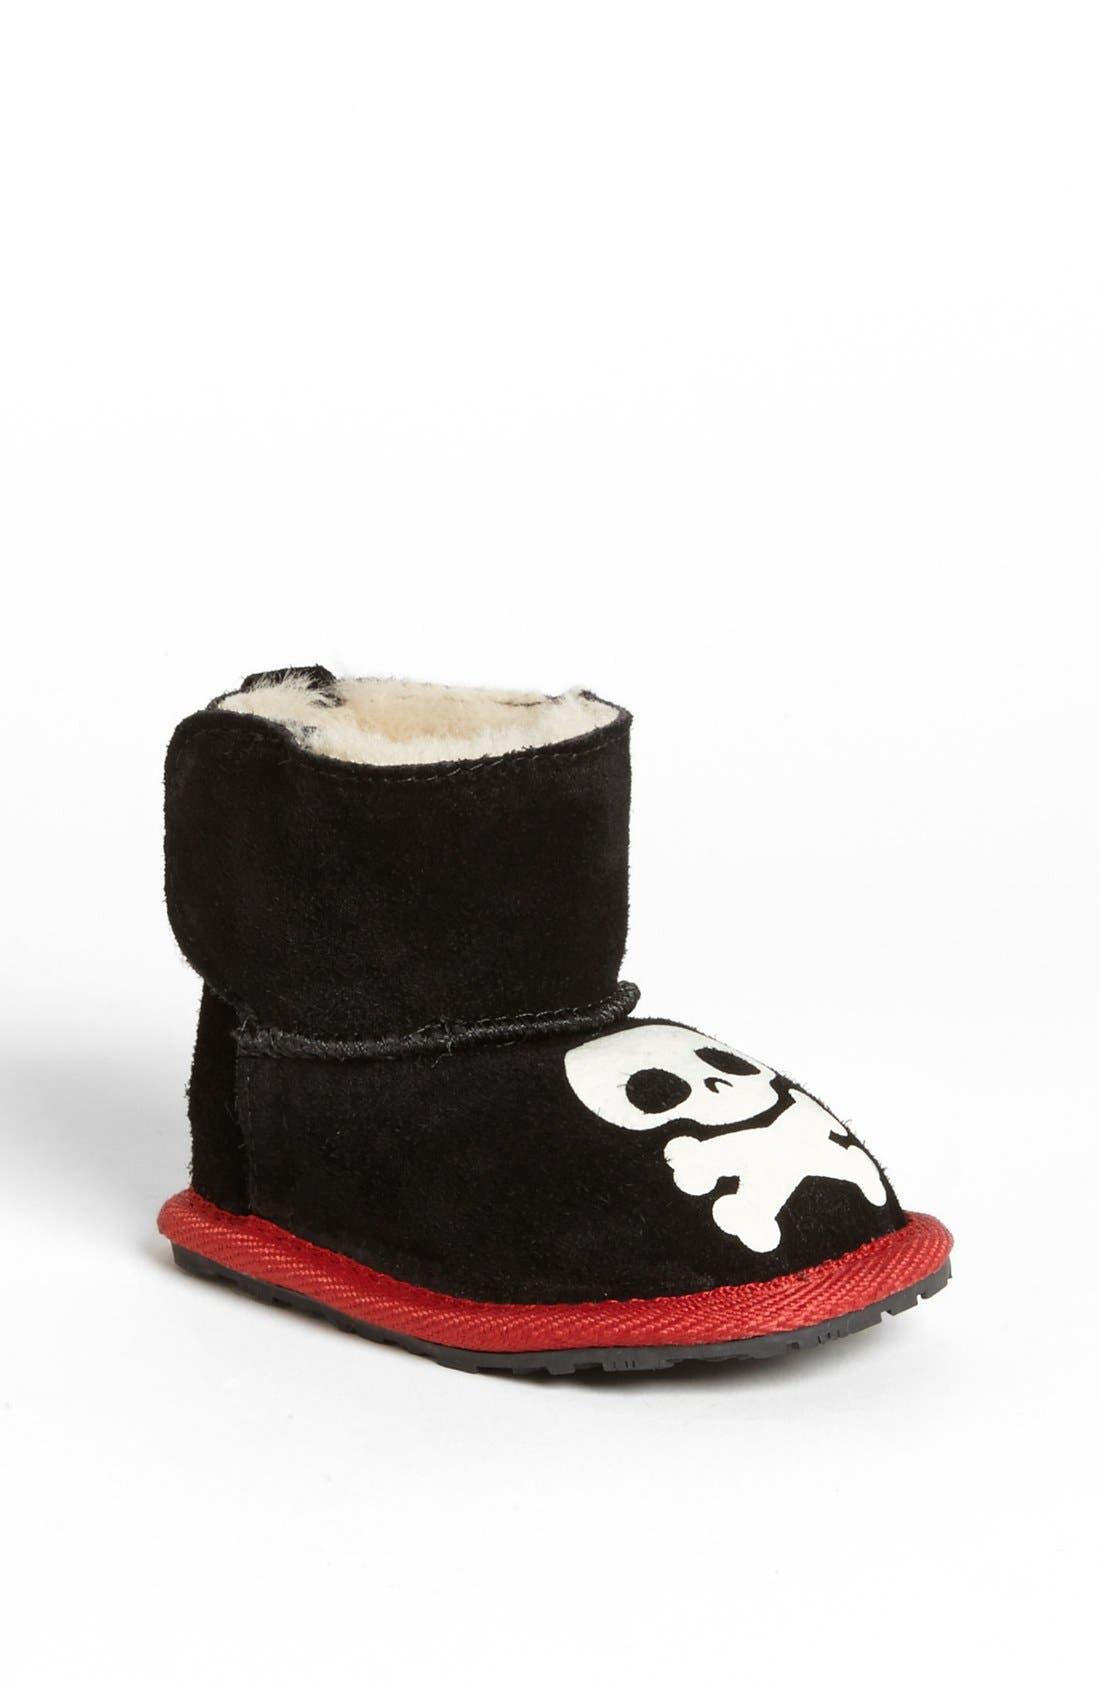 Main Image - EMU Australia 'Scallywag' Boot (Baby & Walker)